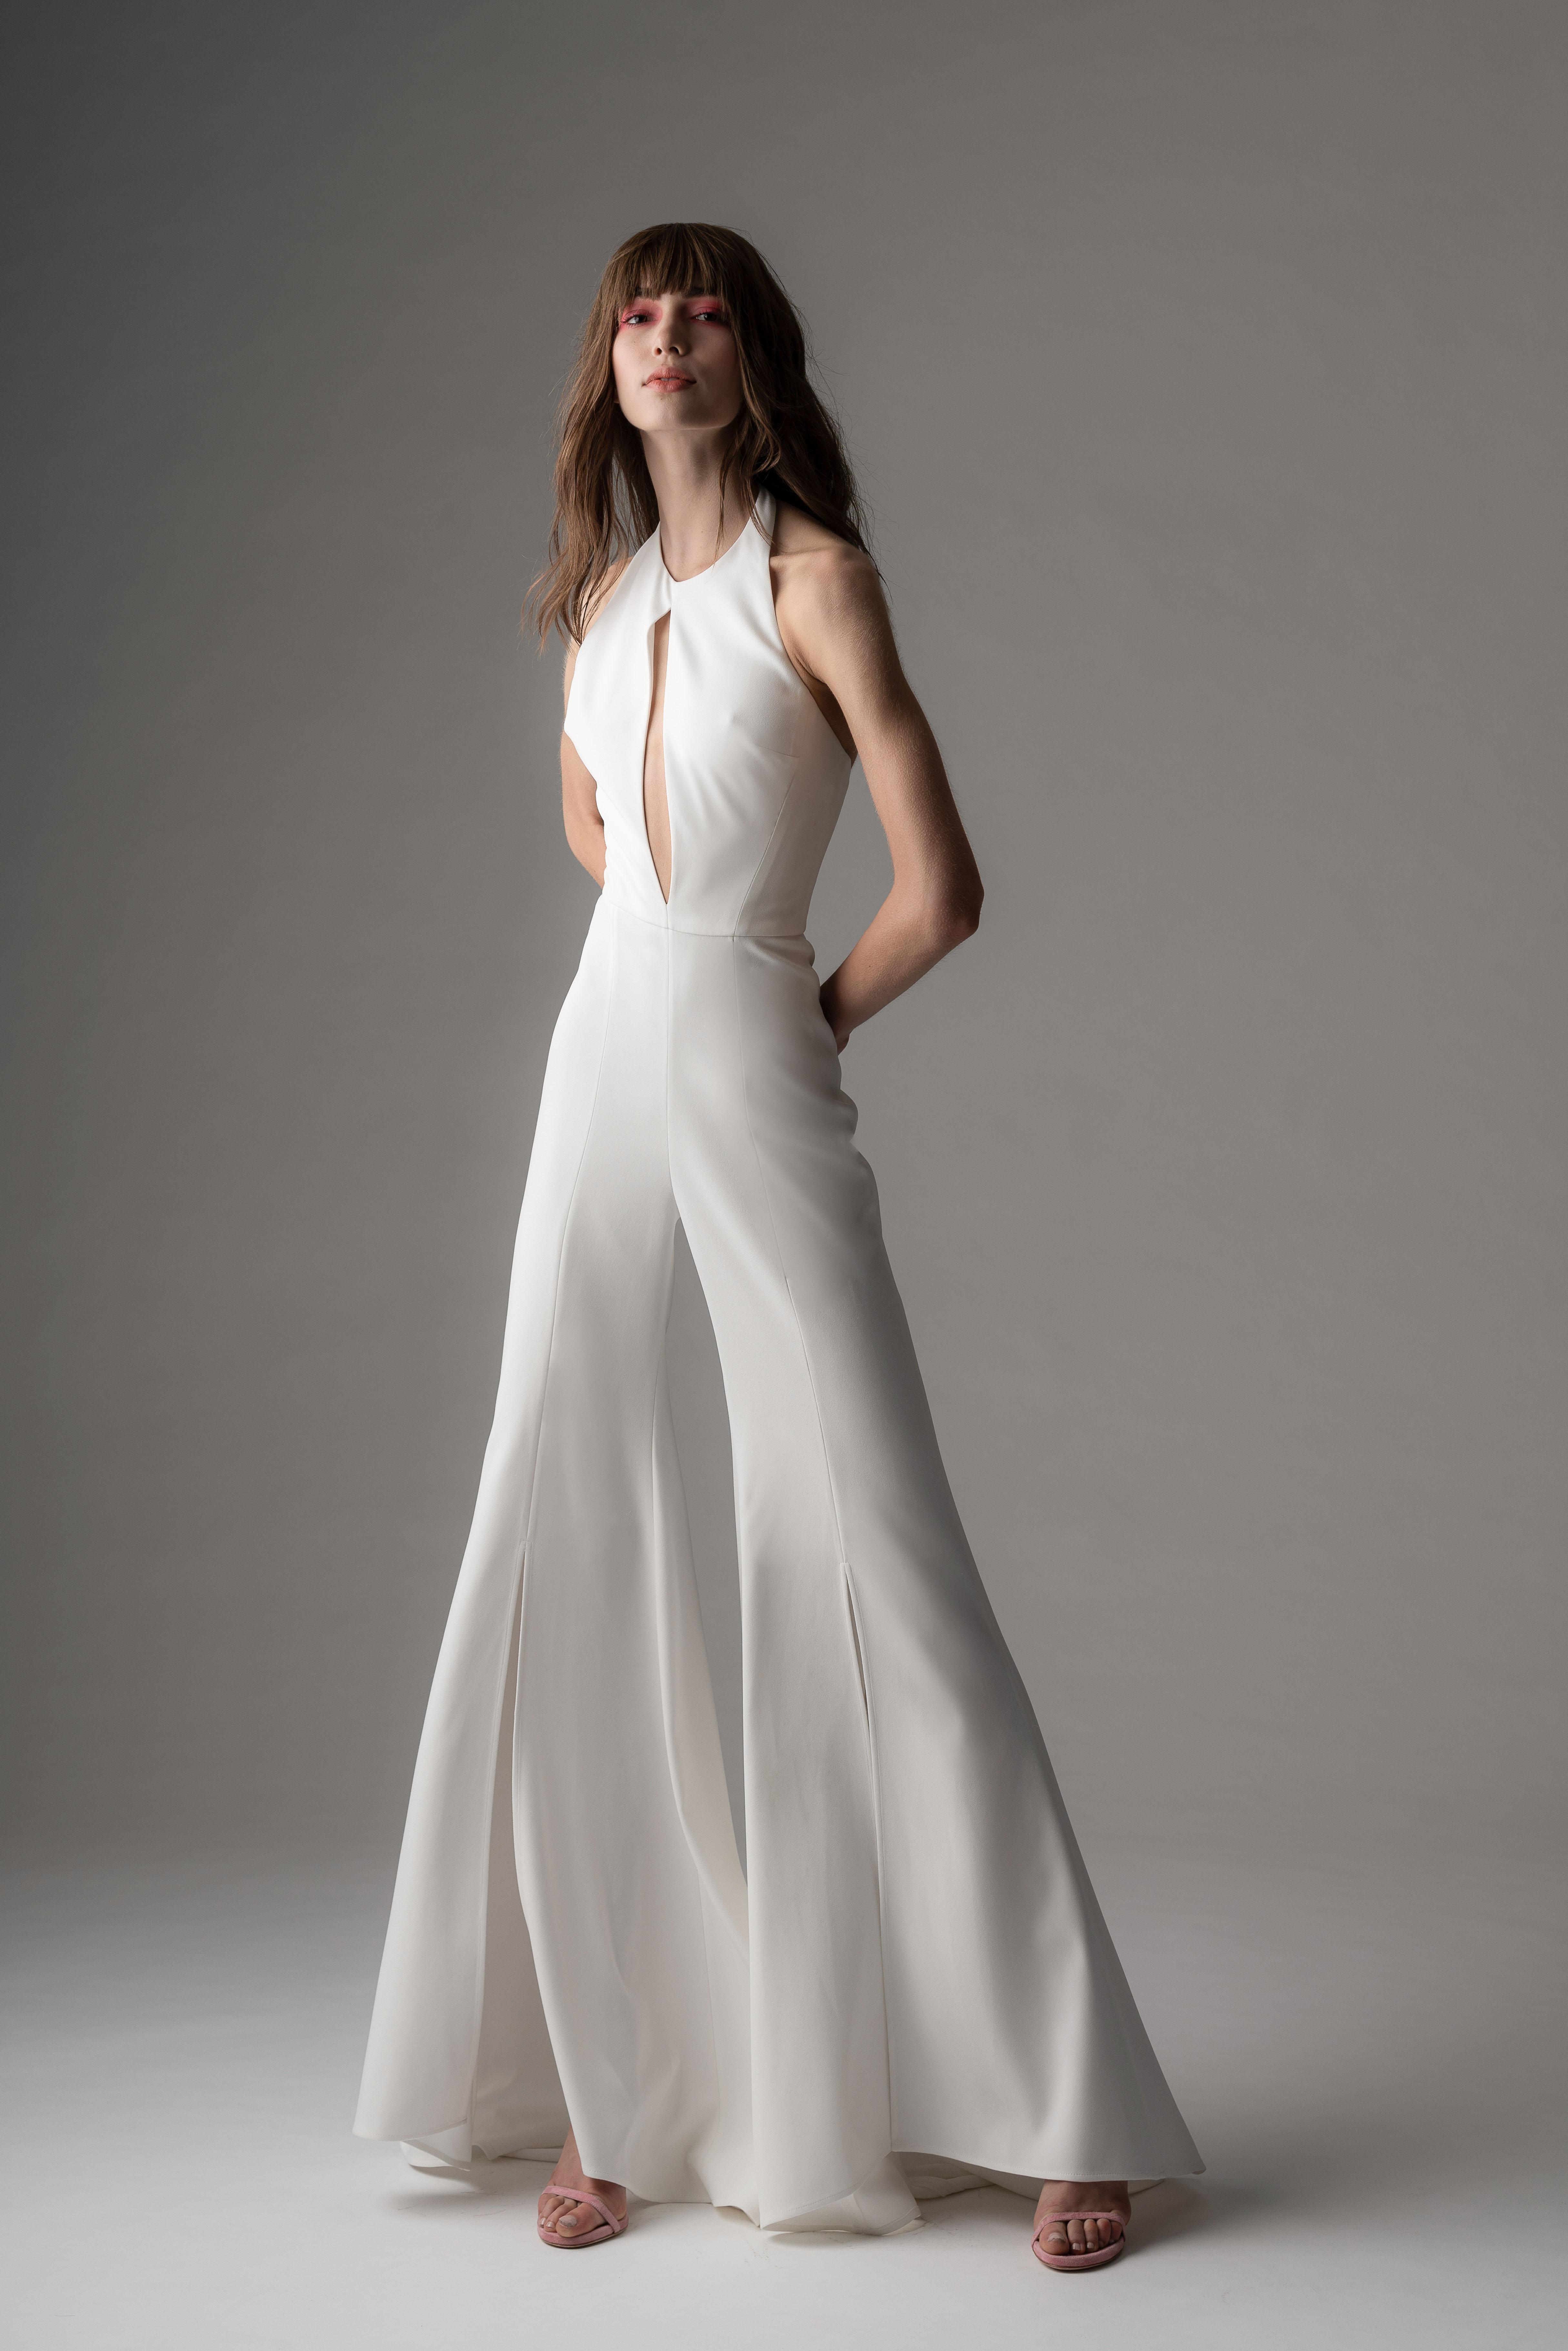 rivini by rita fall 2019 high neck jumpsuit wedding dress